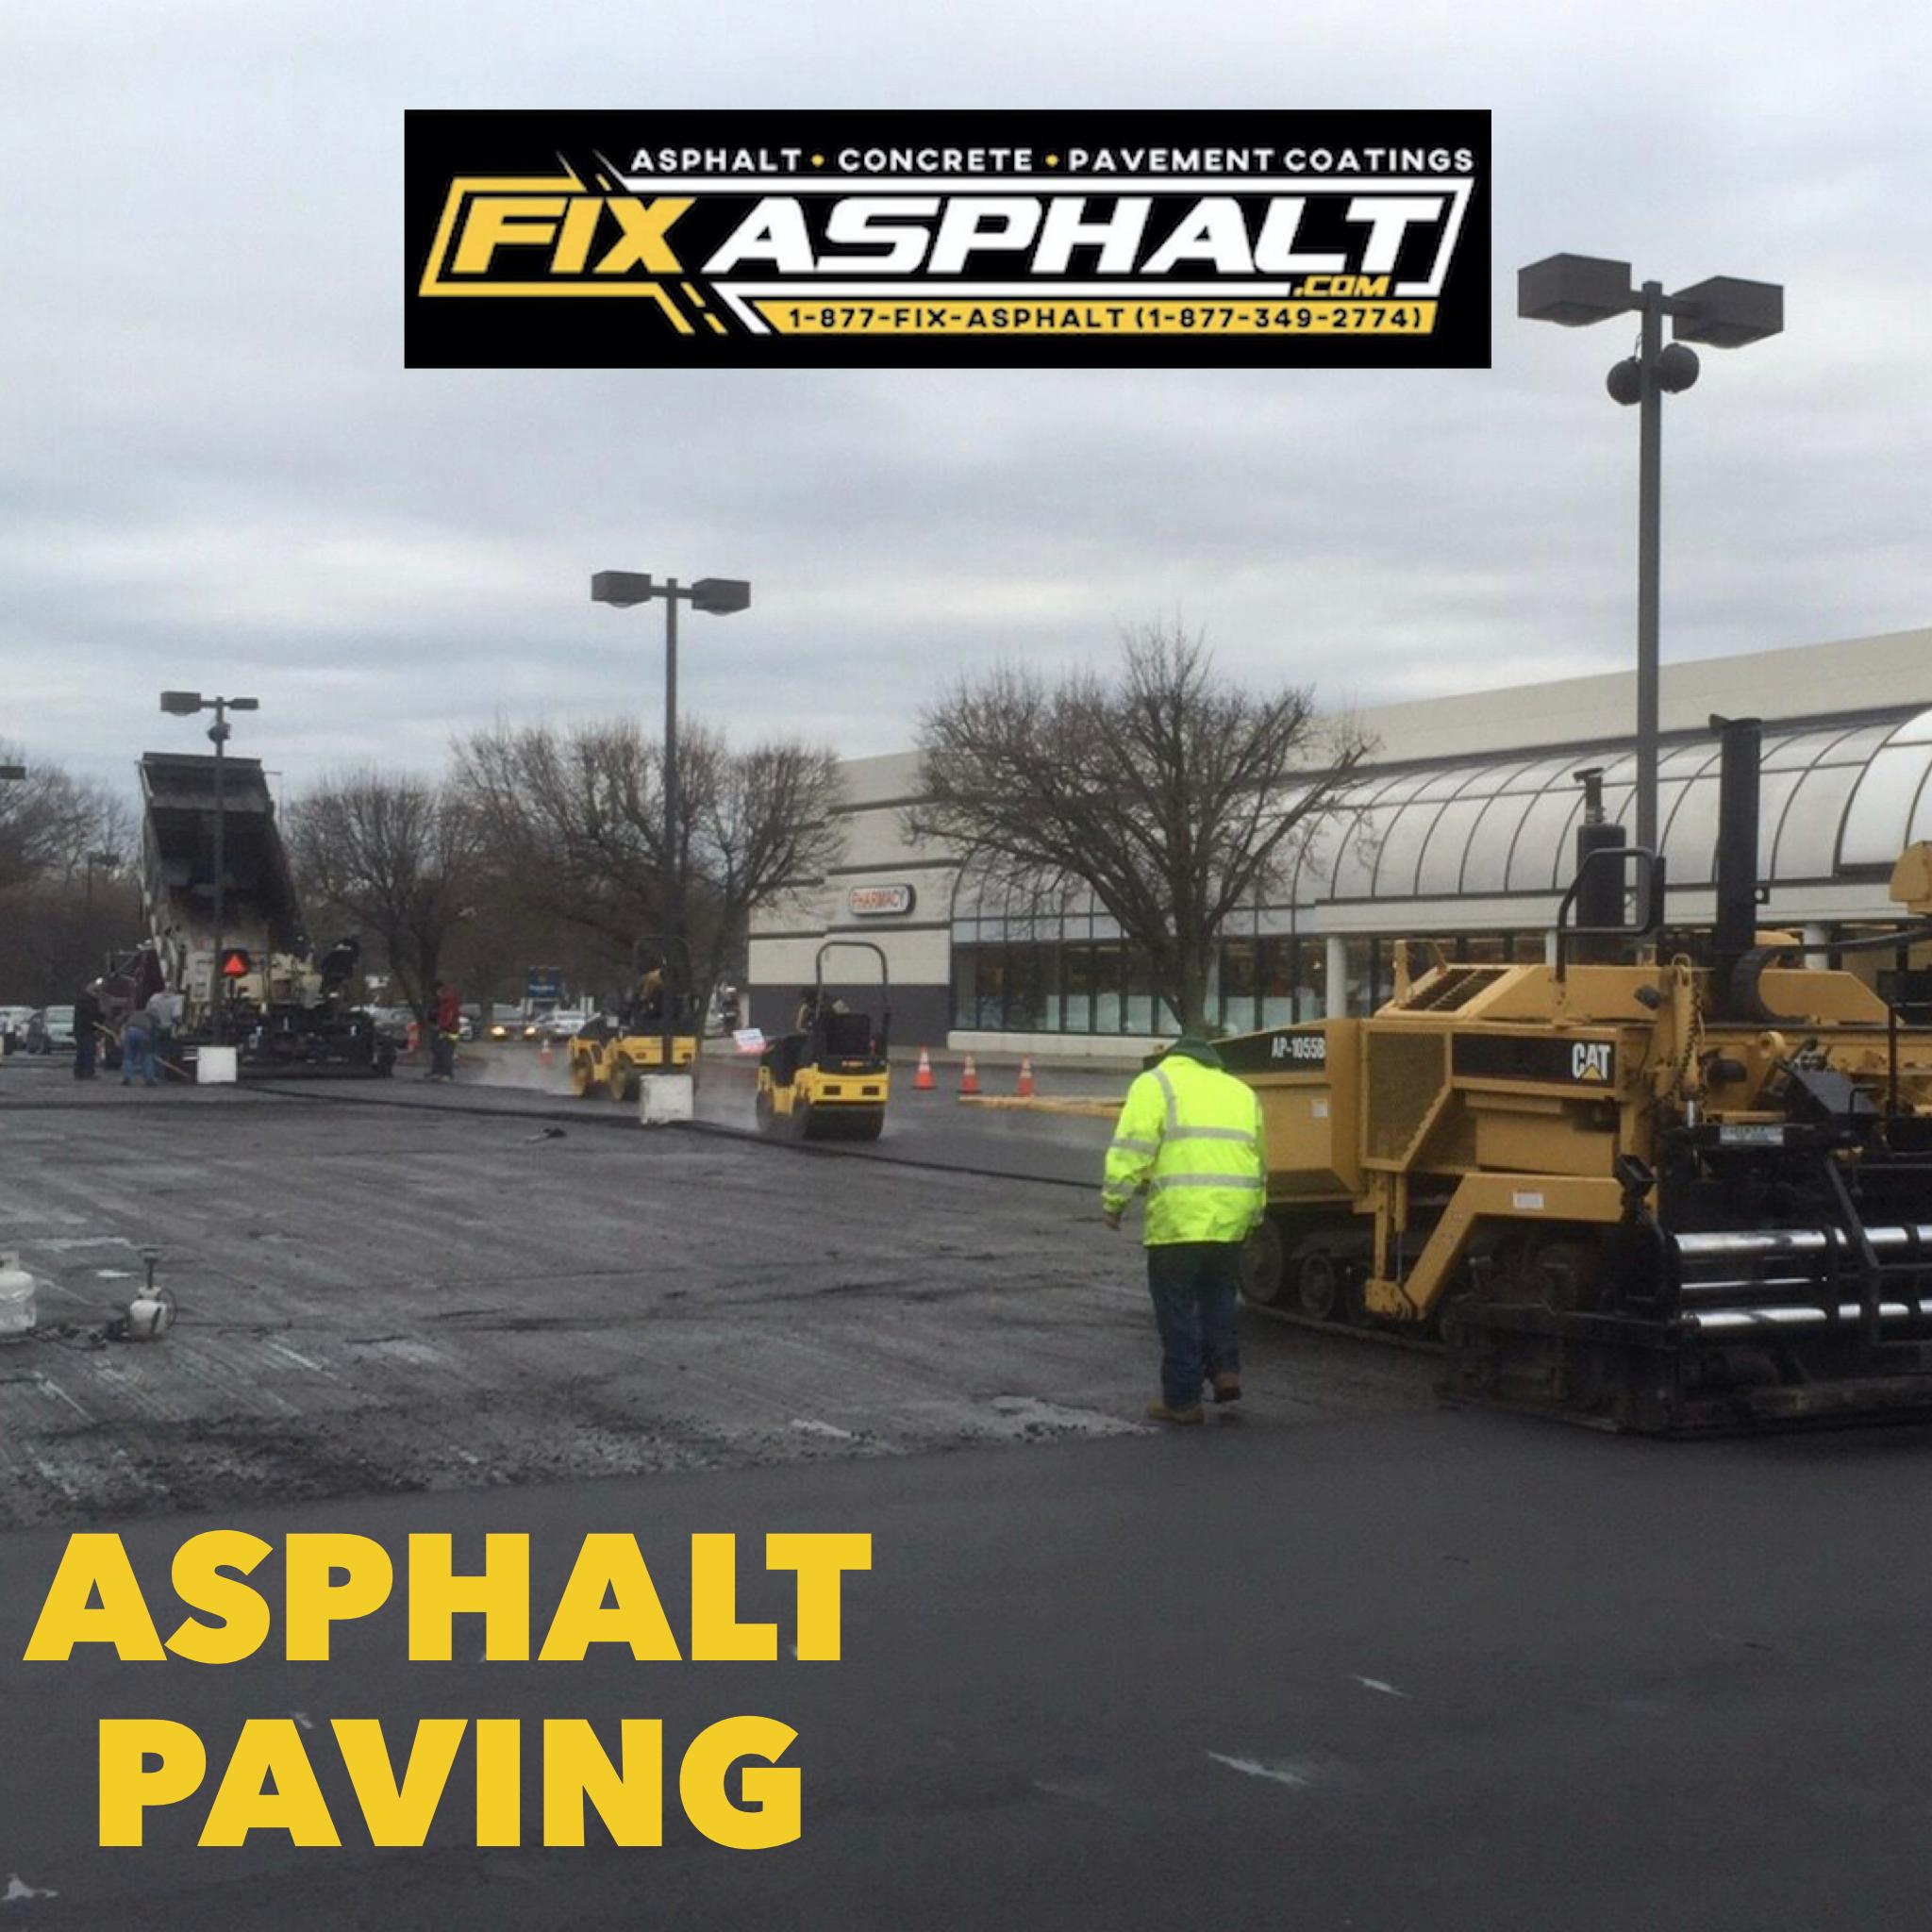 Asphalt Paving Old Bridge New Jersey